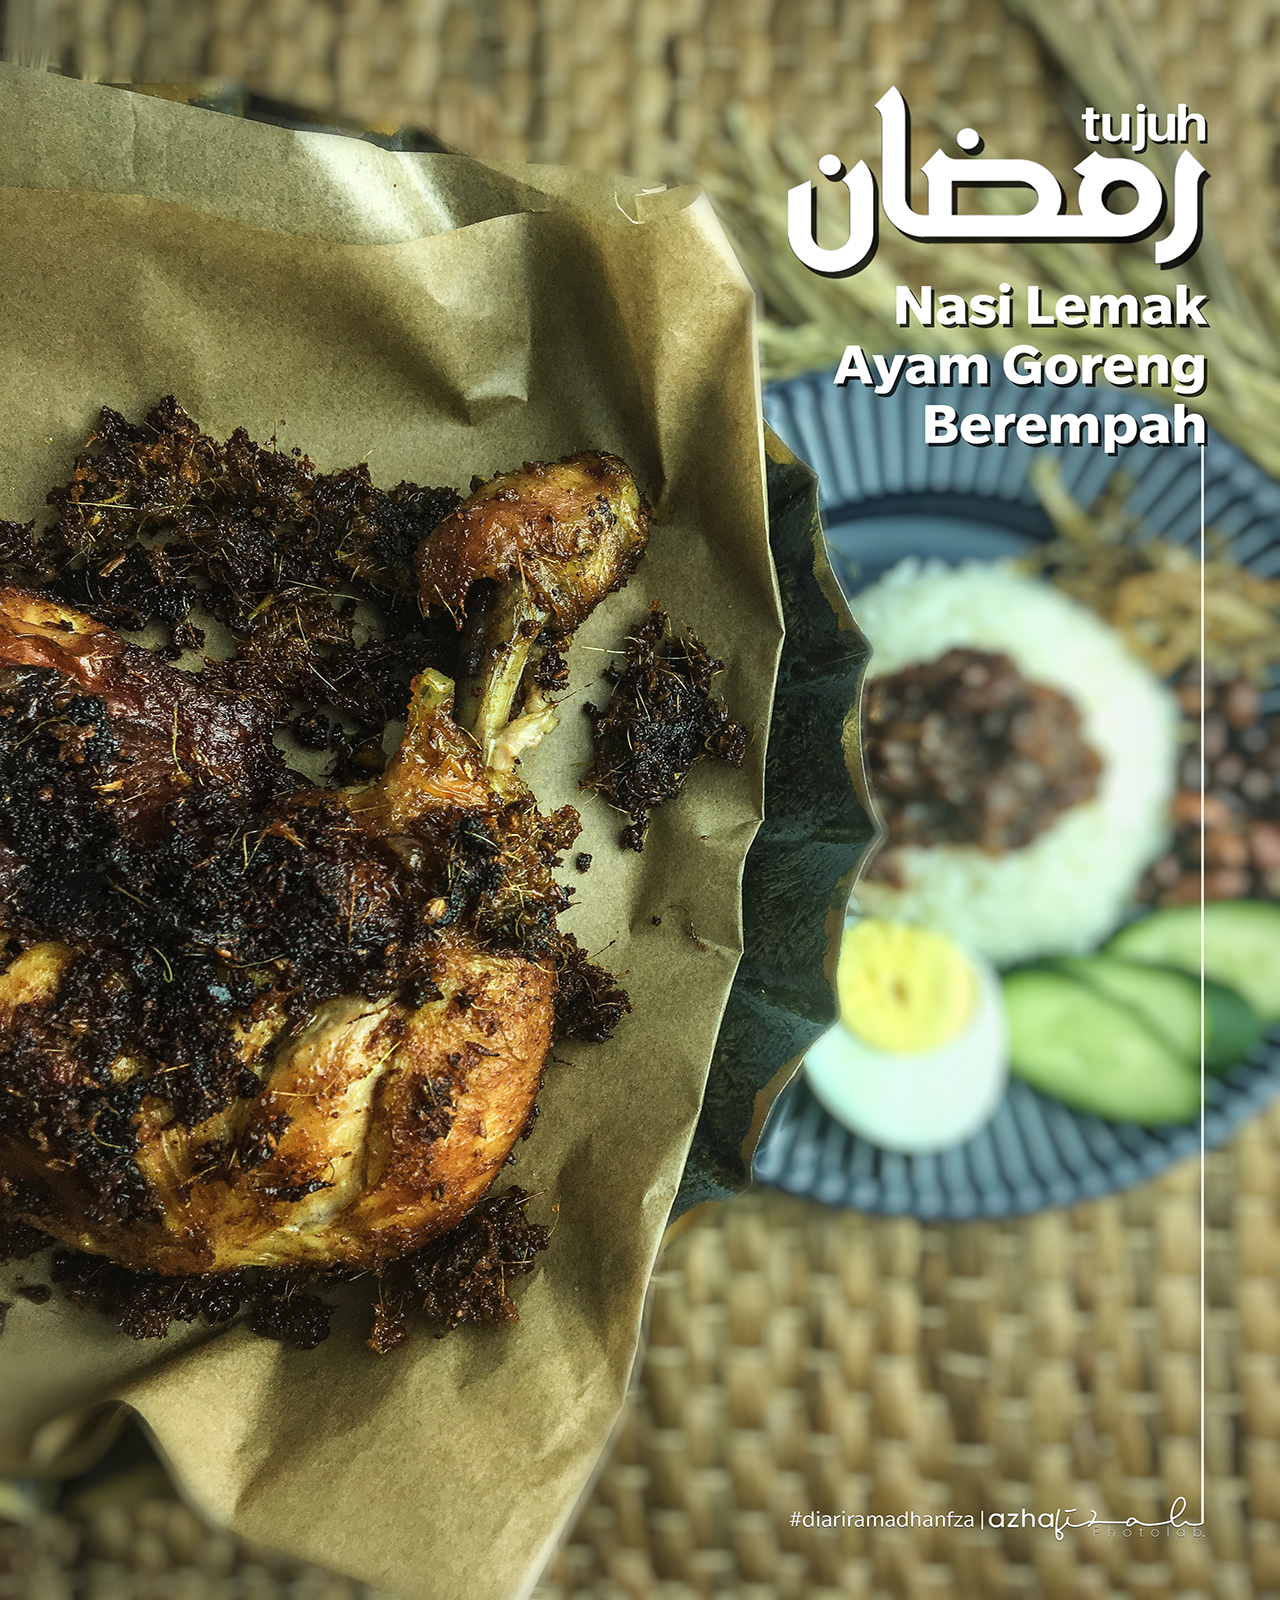 Resepi Nasi Lemak Dan Ayam Goreng Berempah Sedap